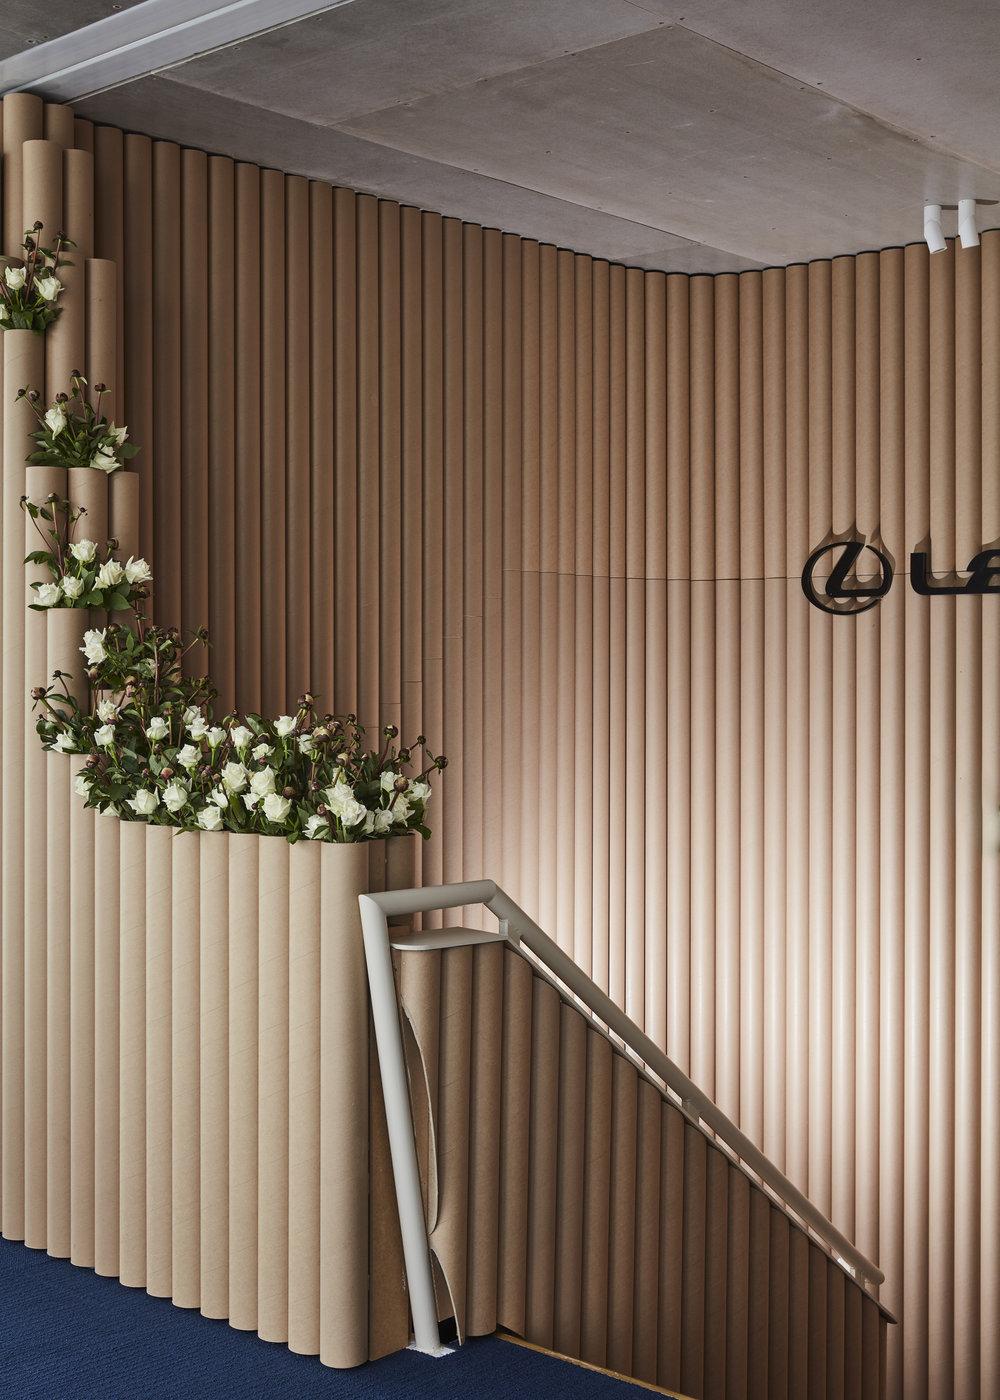 Lexus Design Pavilion 2016 -